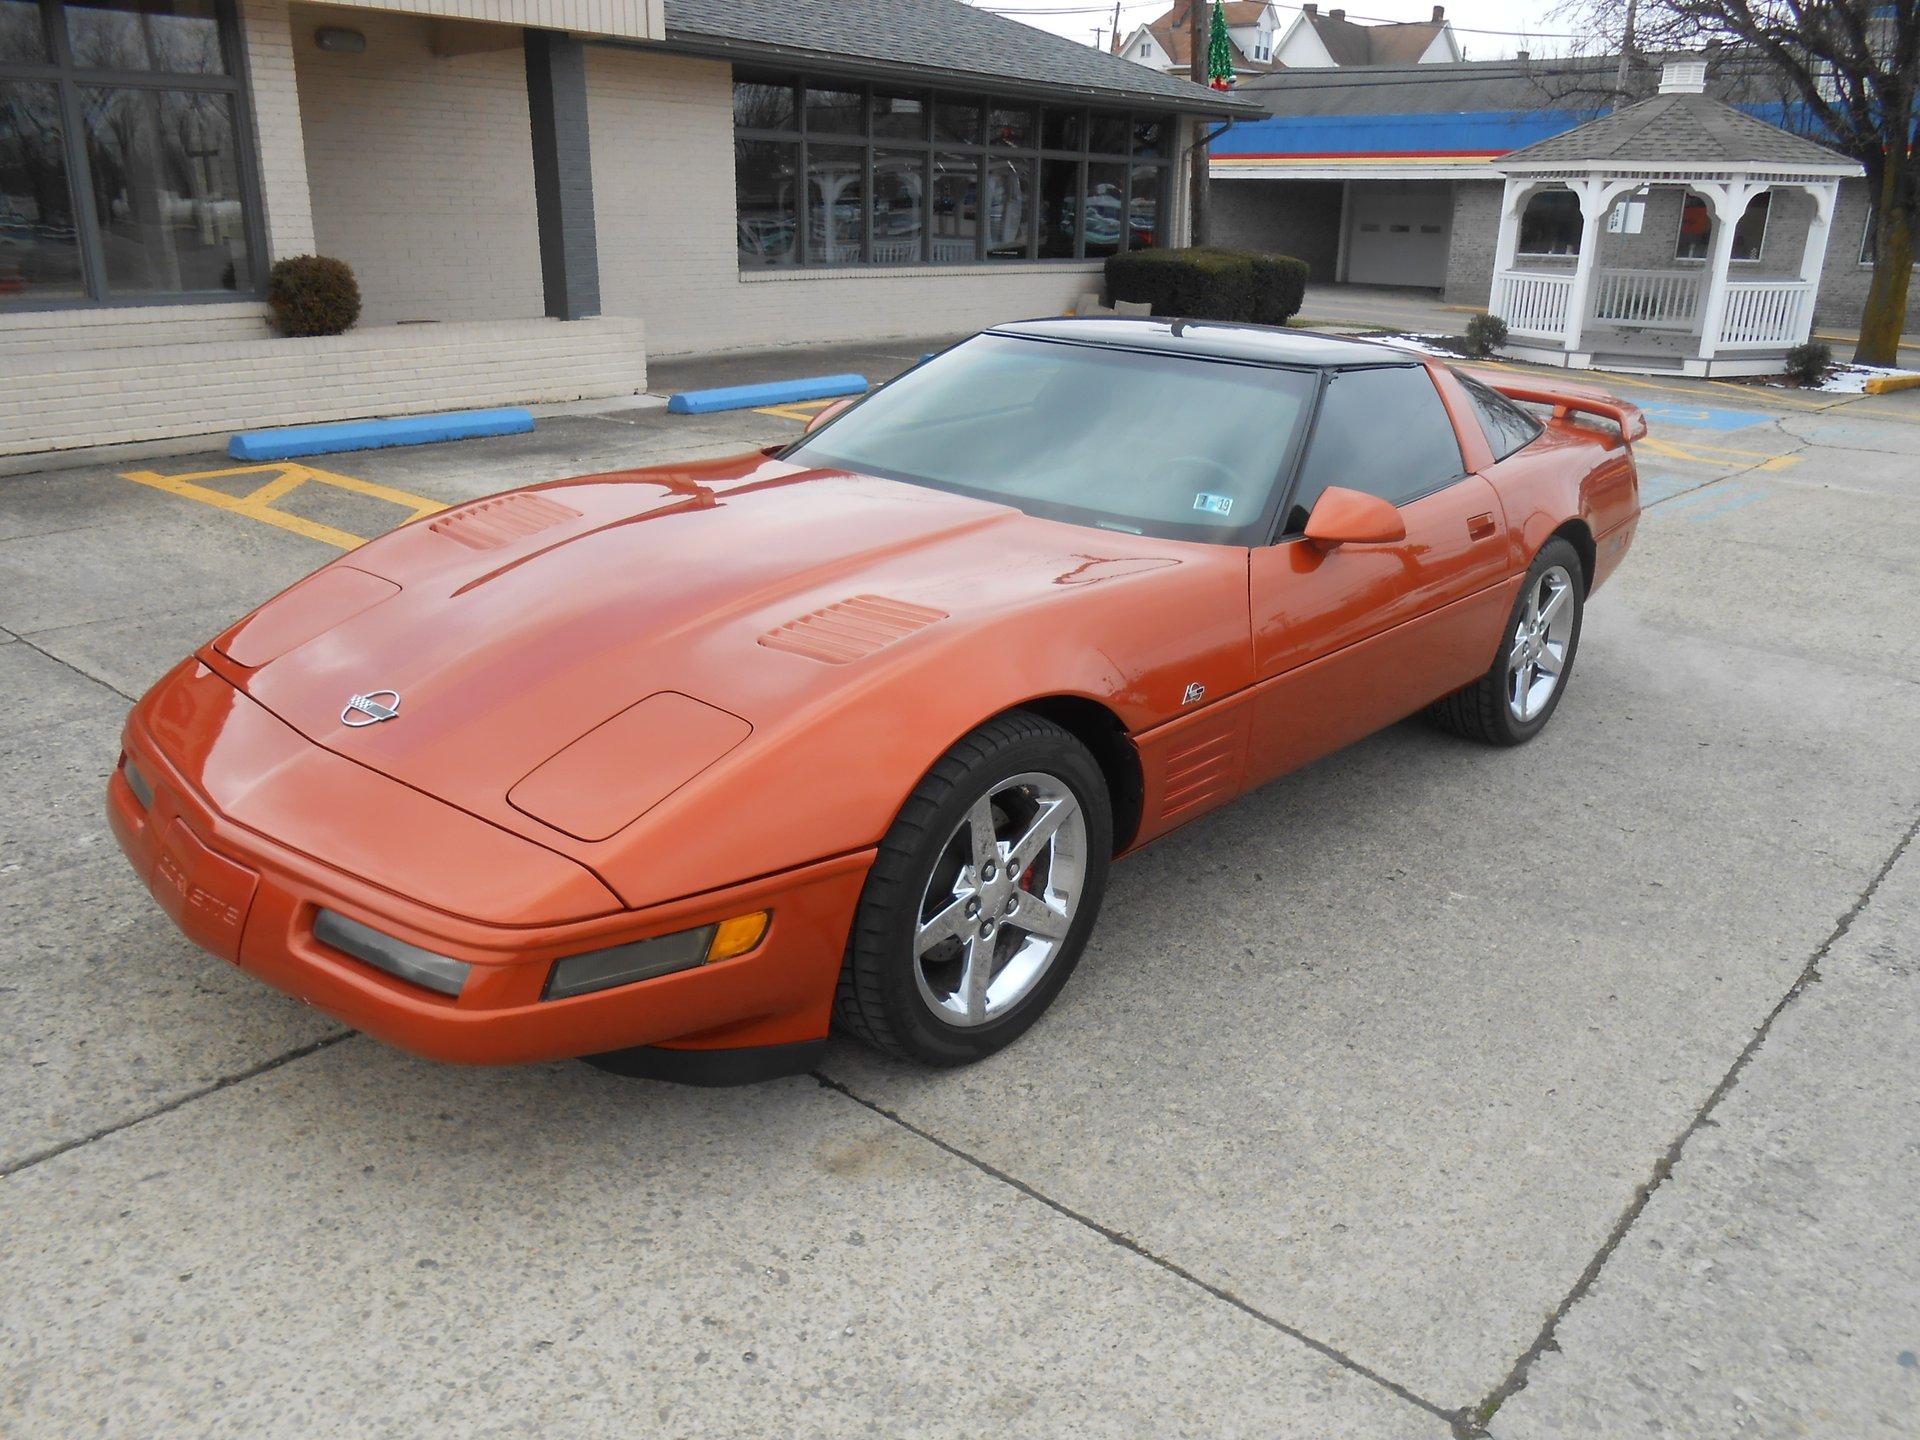 1993 Chevrolet Corvette | GAA Classic Cars